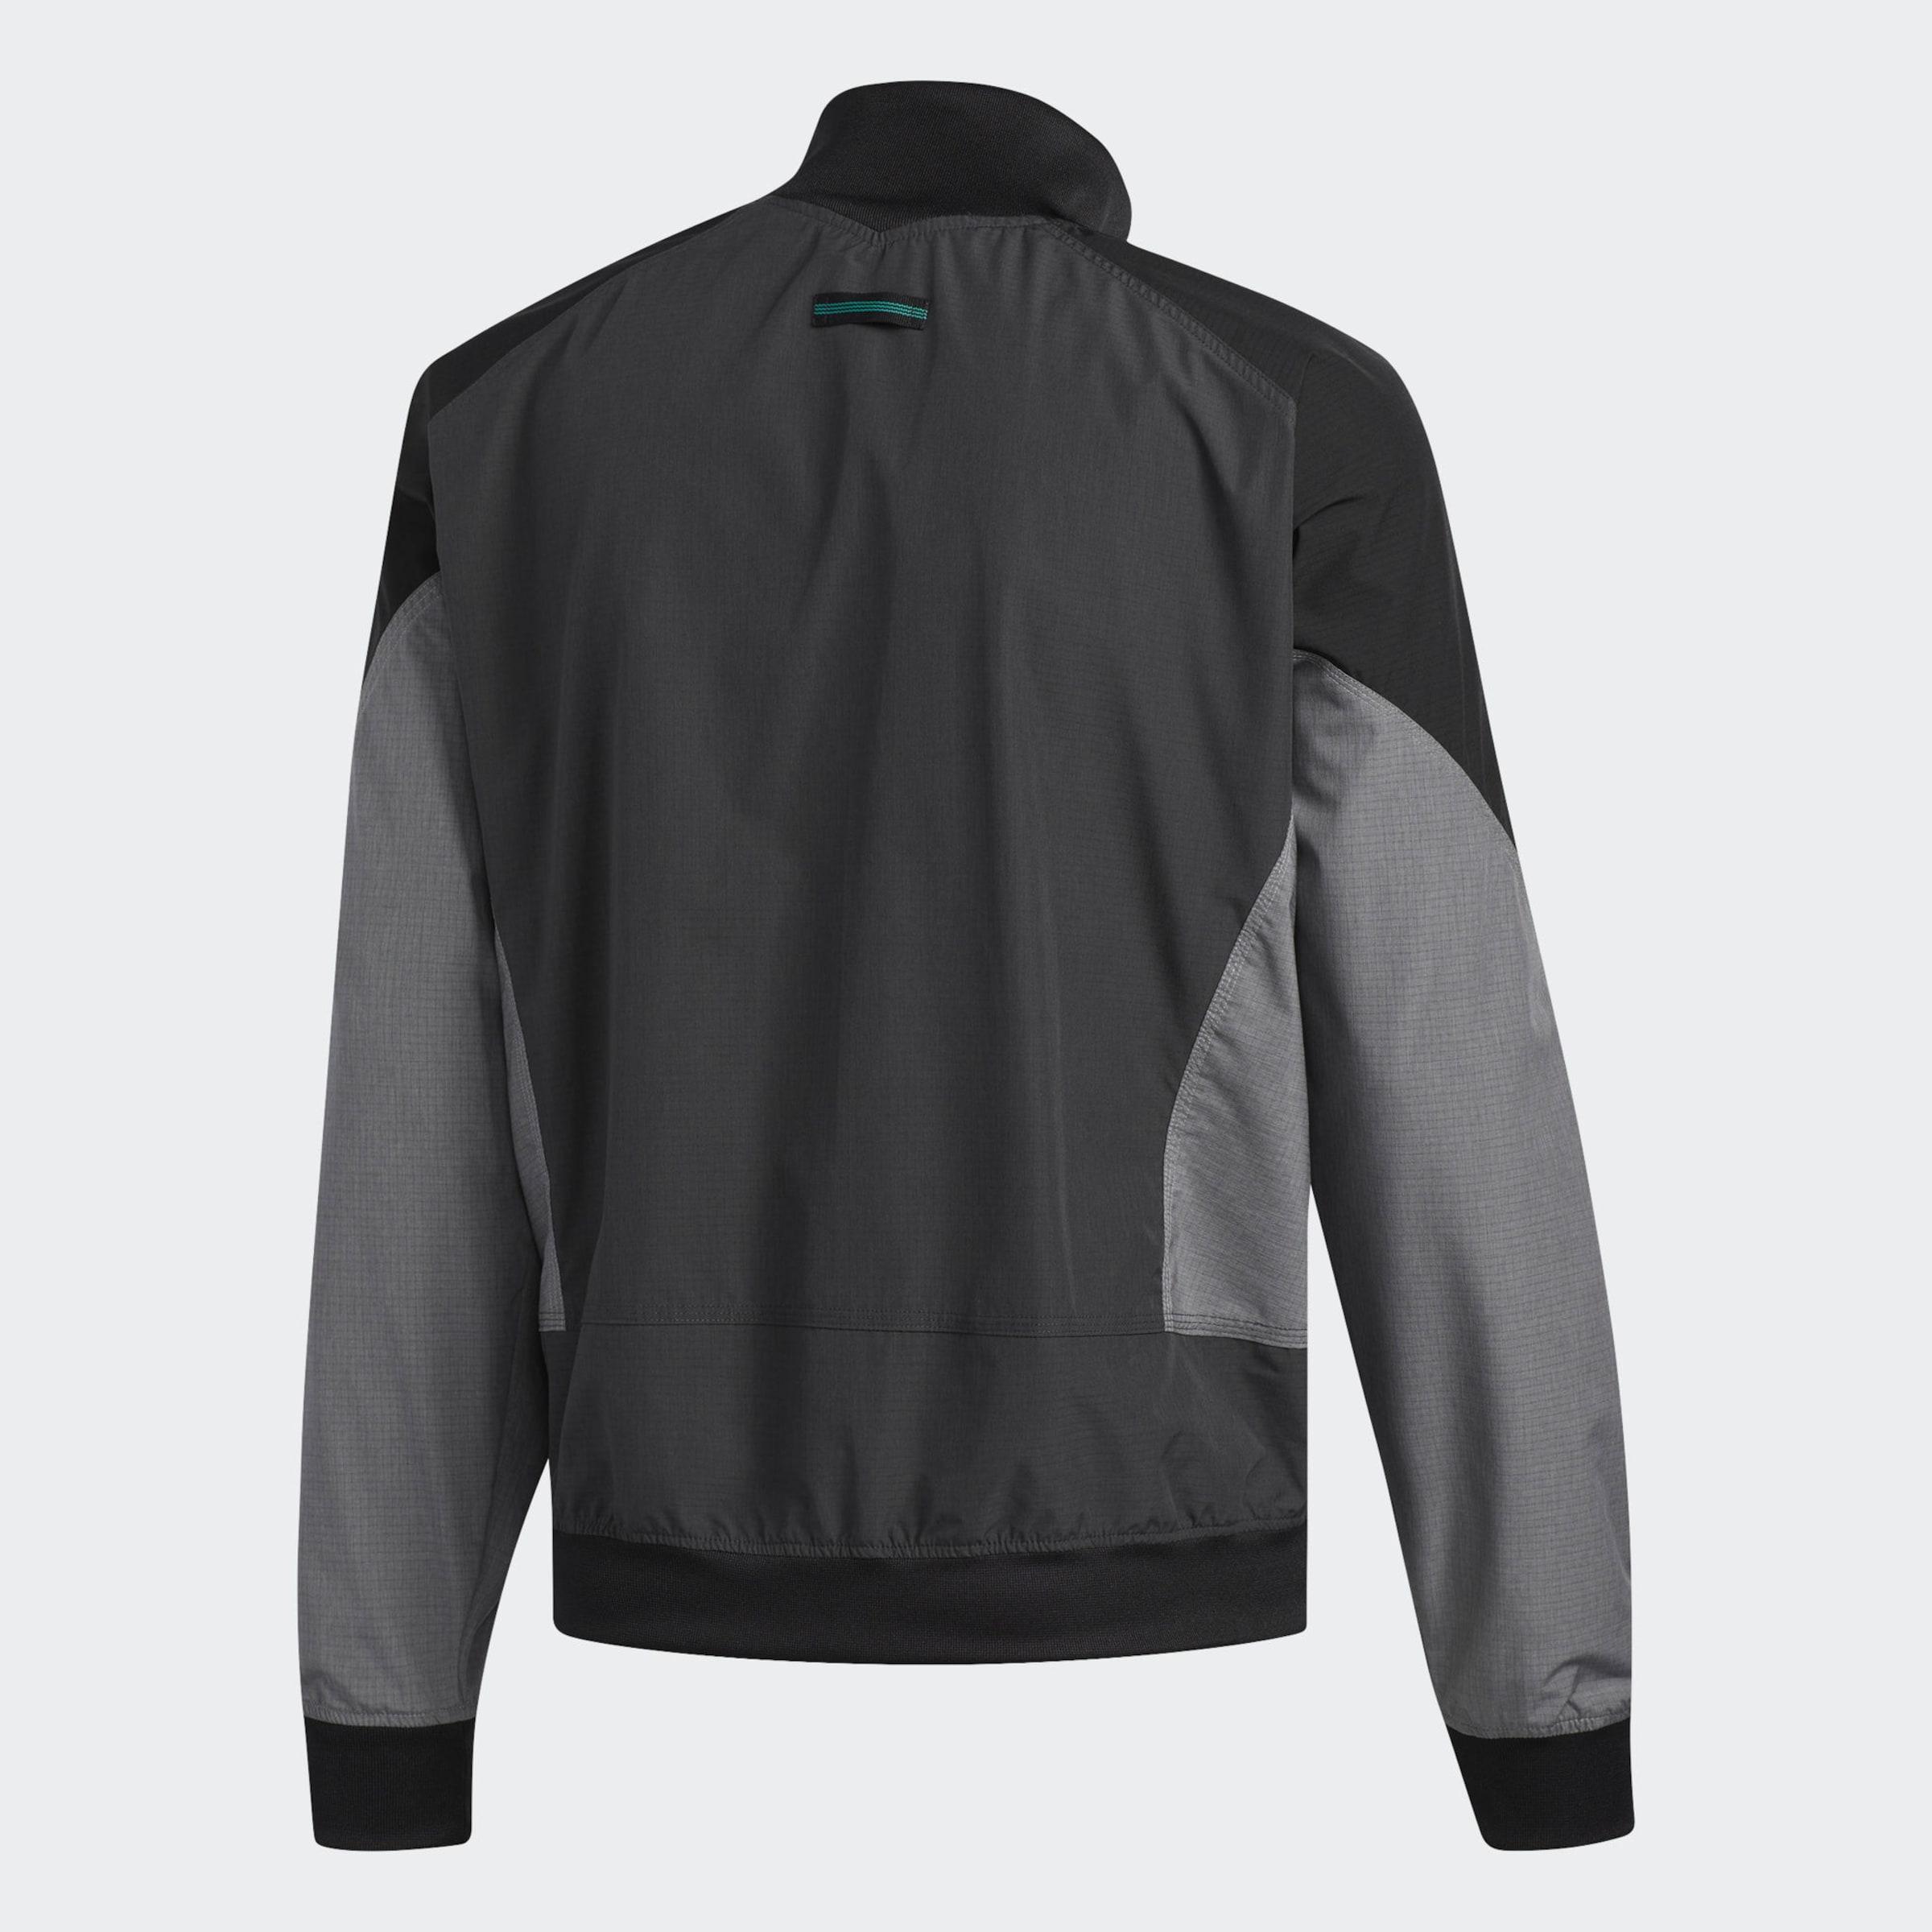 Jacke Adidas Originals Adidas Anthrazit In Originals W2EID9eHY